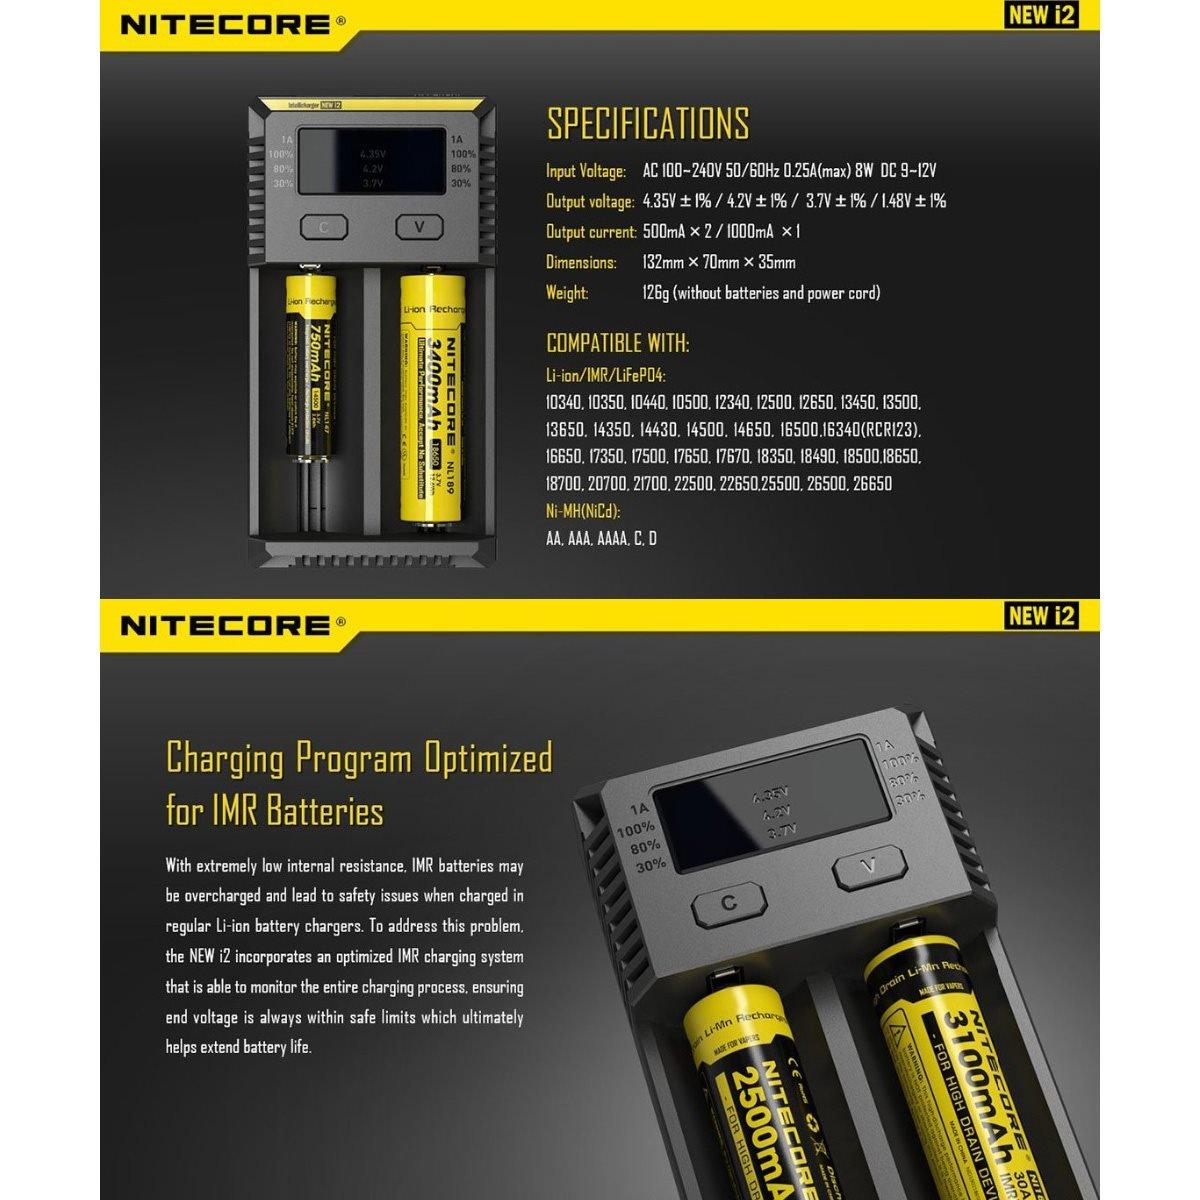 NITECORE i2 2016 Version Intellicharger Universal Smart Battery Charger For Li-ion/IMR/Ni-MH/Ni-Cd 26650 22650 18650 Batteries Charging